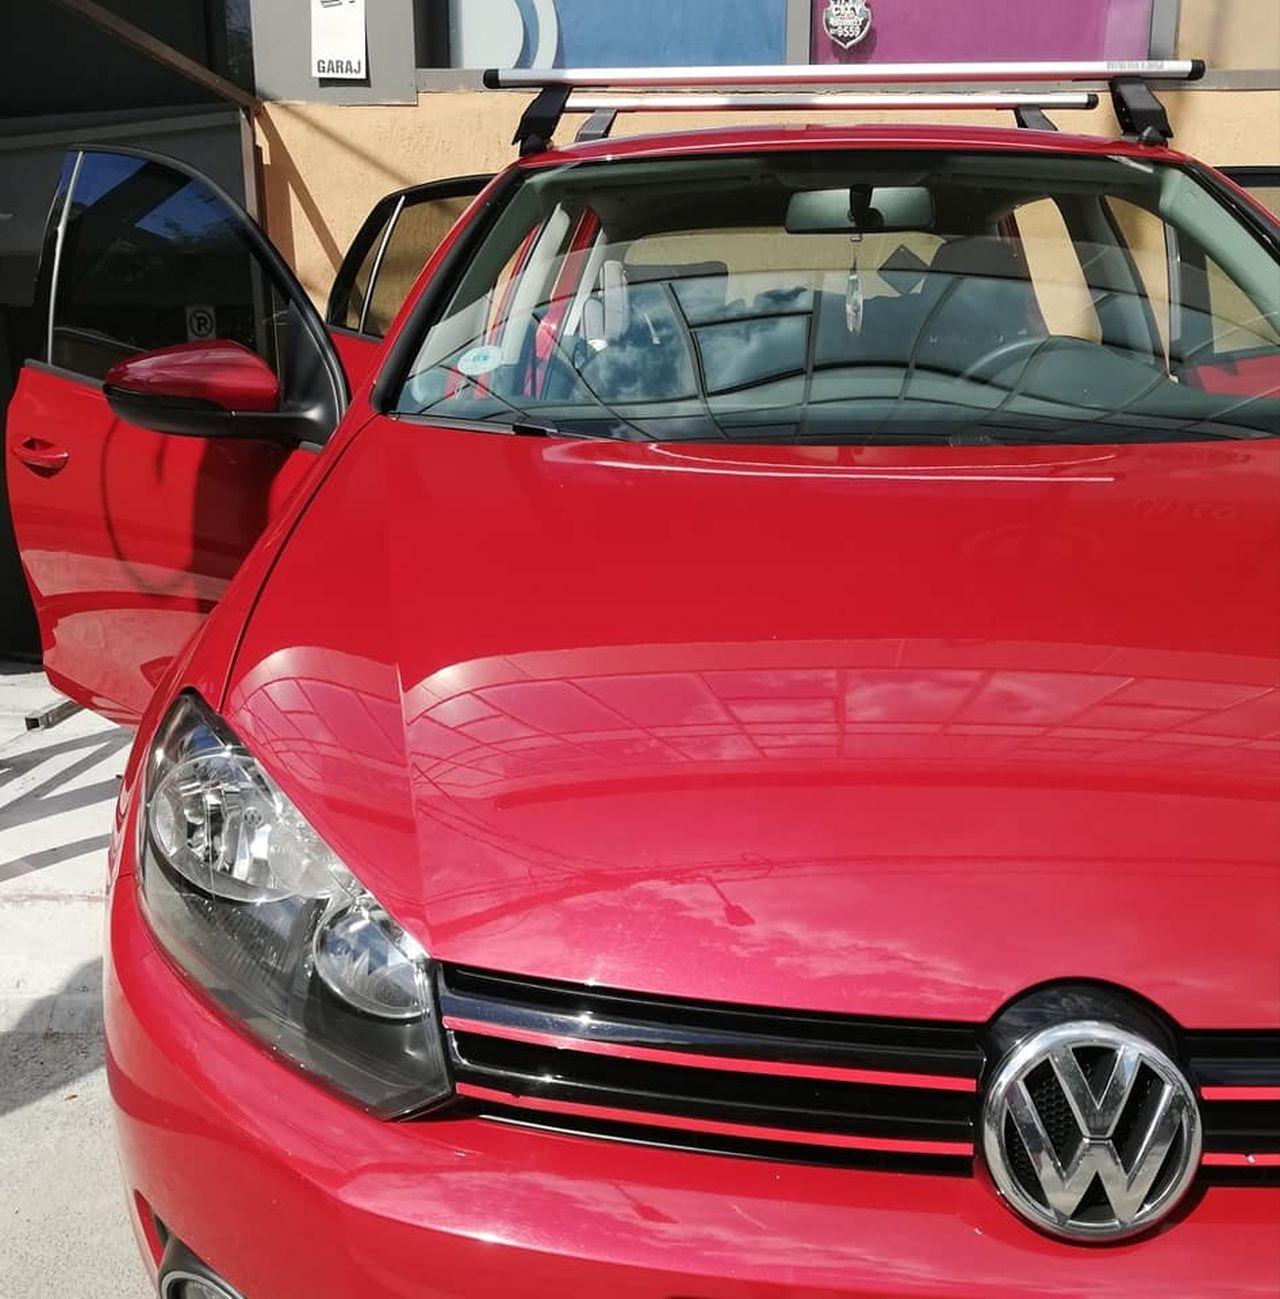 Volkswagen Golf 6 bare transversale Menabo Tema si suport bicicleta